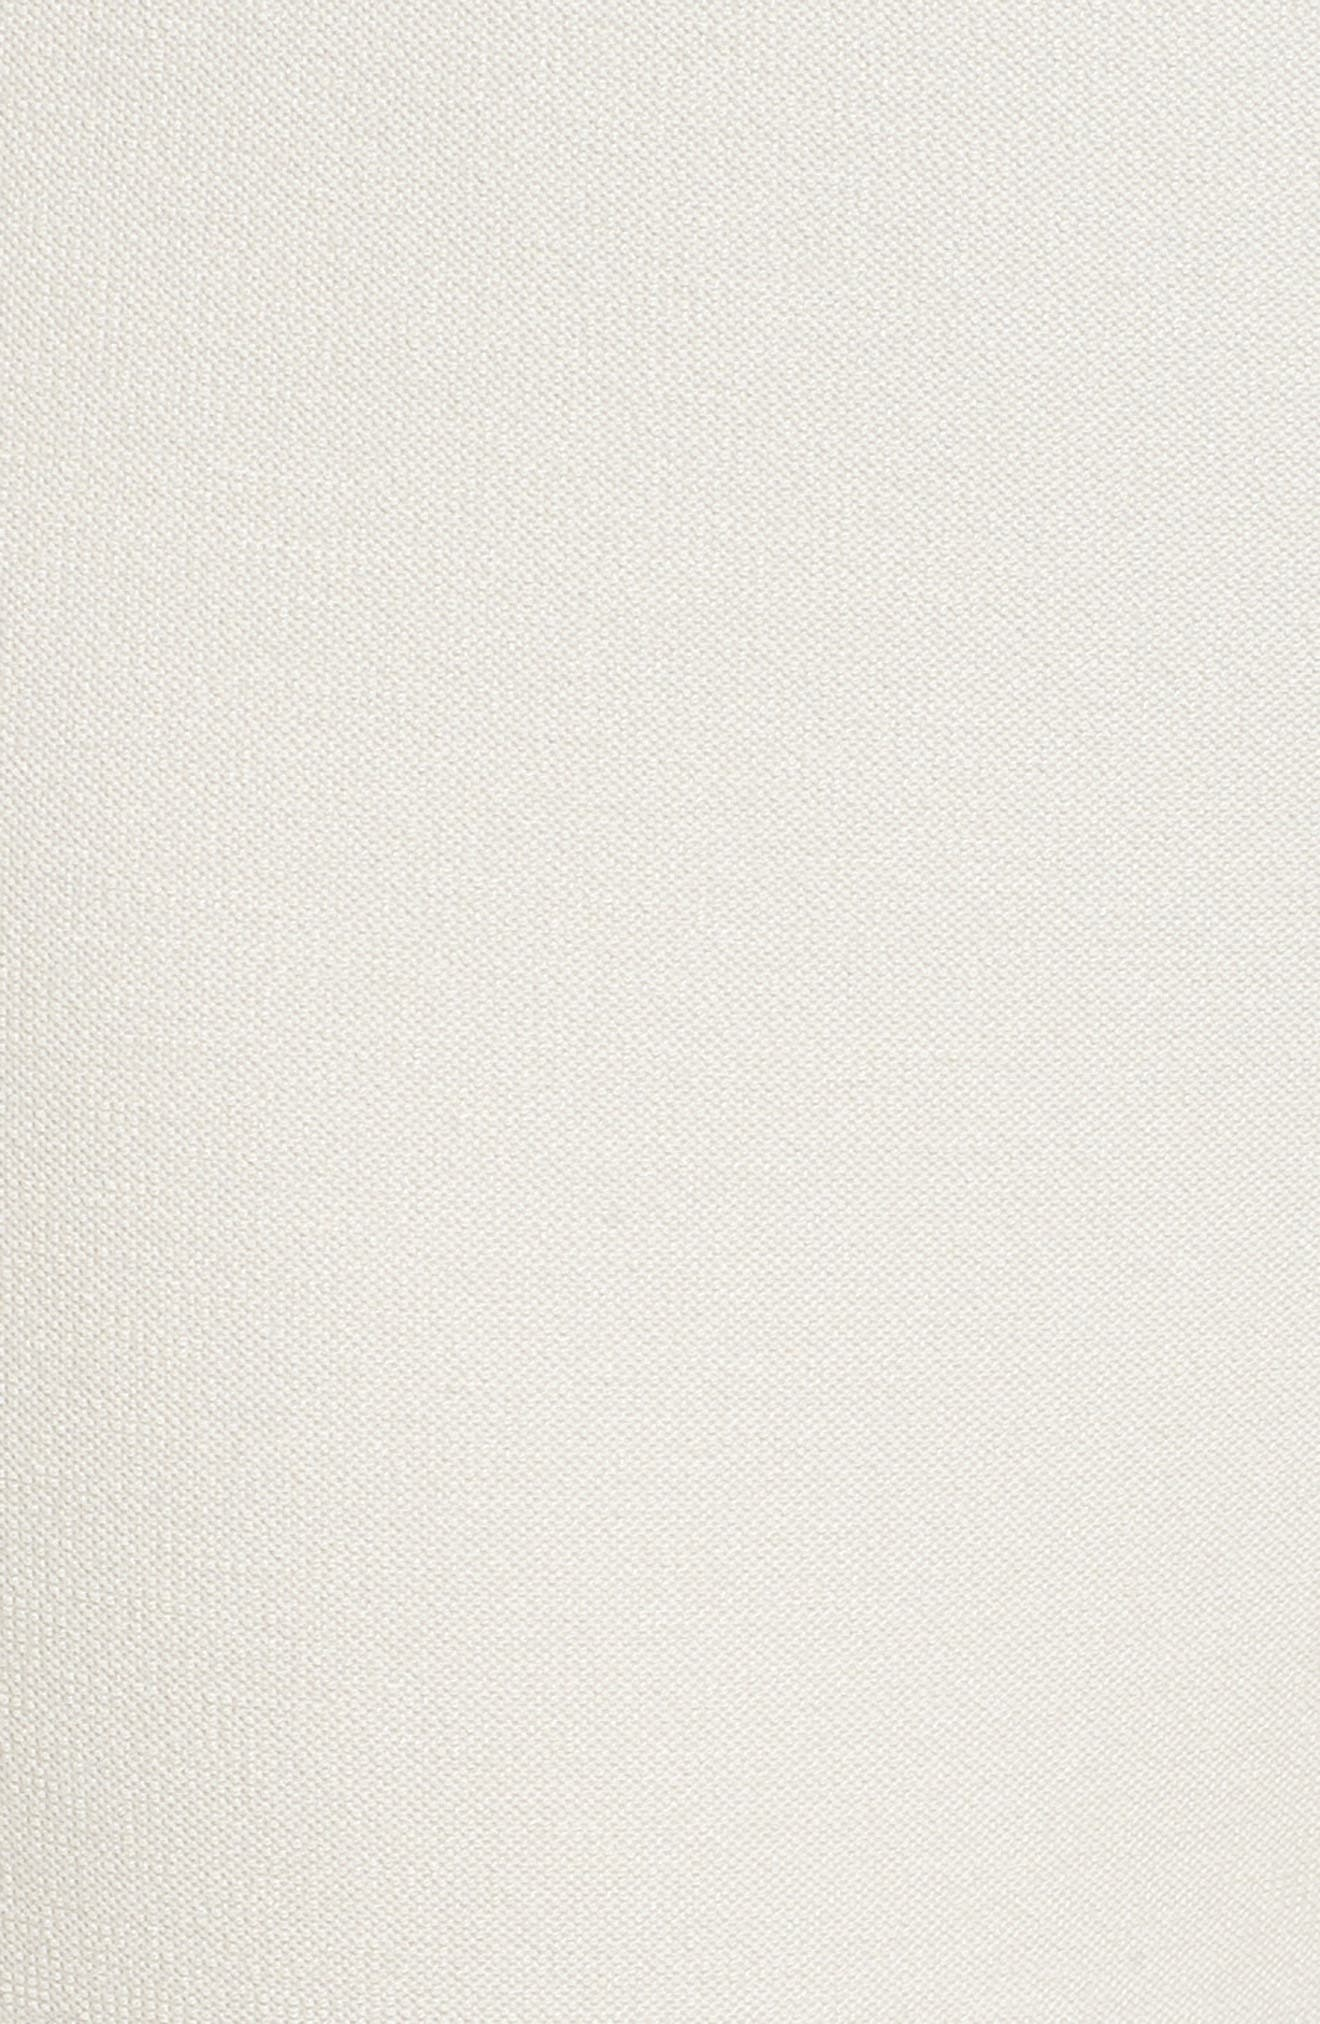 Foldover Waist Stretch Crepe Capri Pants,                             Alternate thumbnail 6, color,                             907